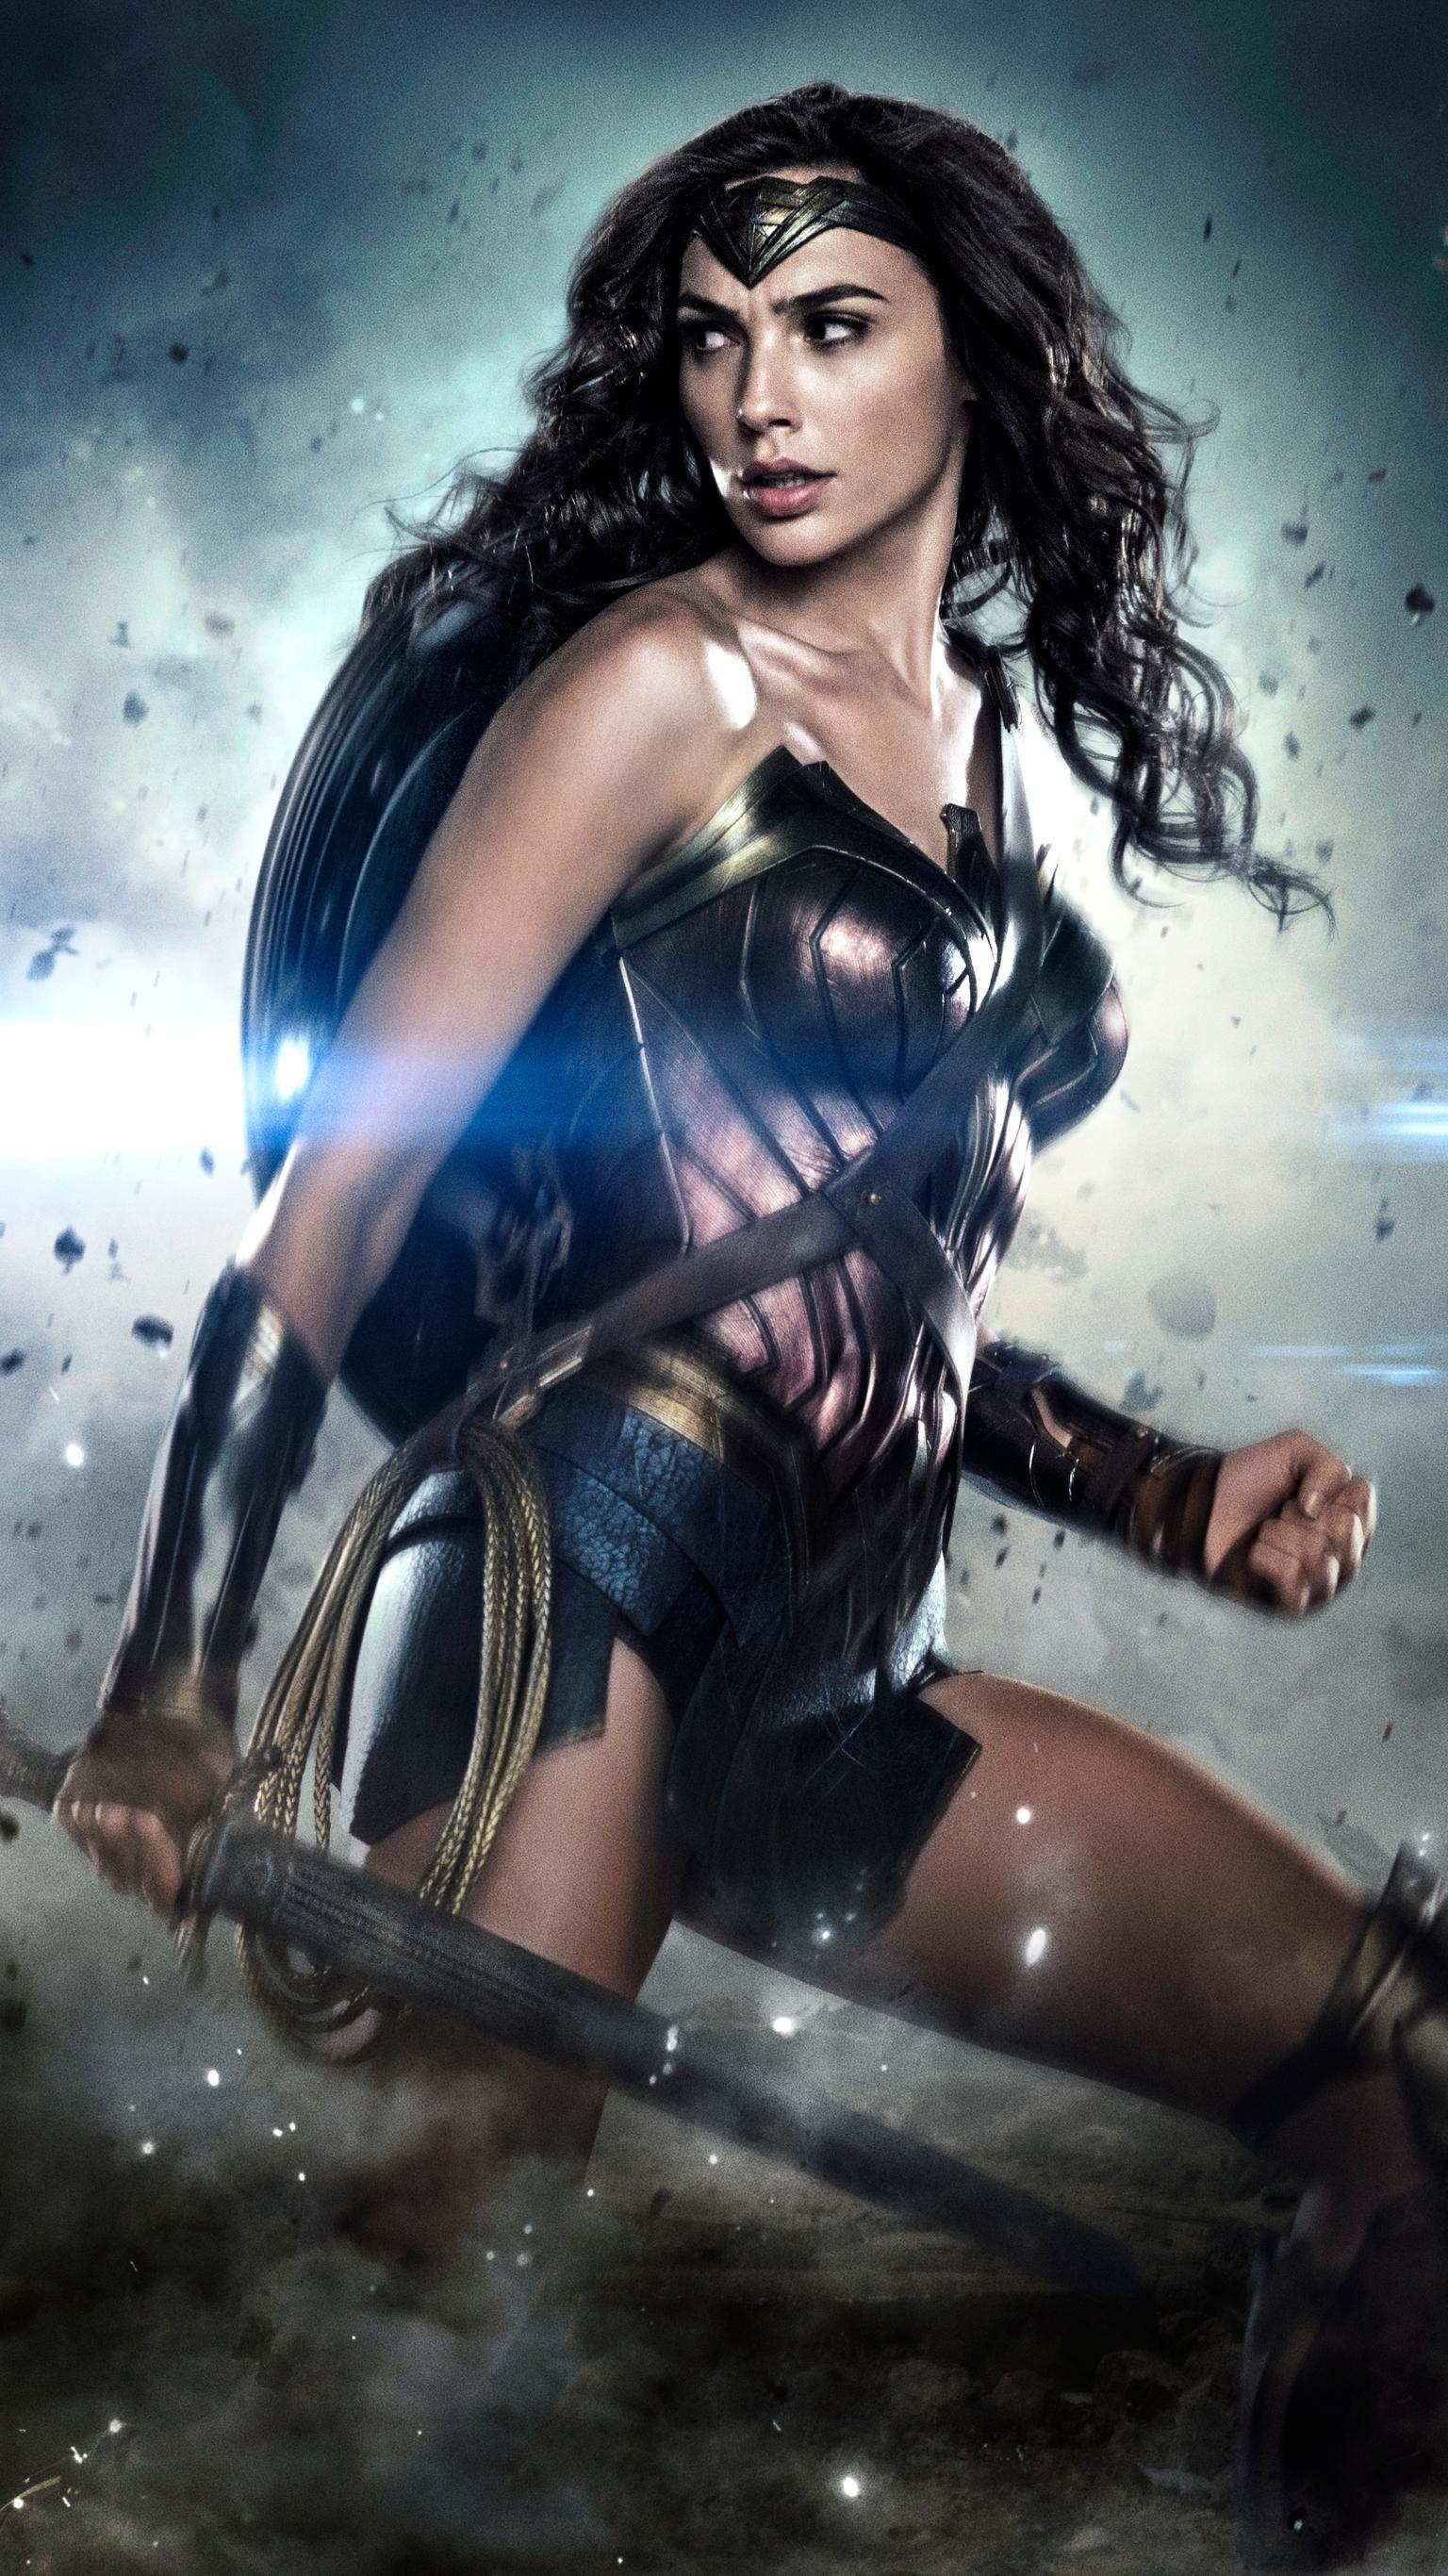 Wonder Woman Wallpaper Screen Savers (67+ images)